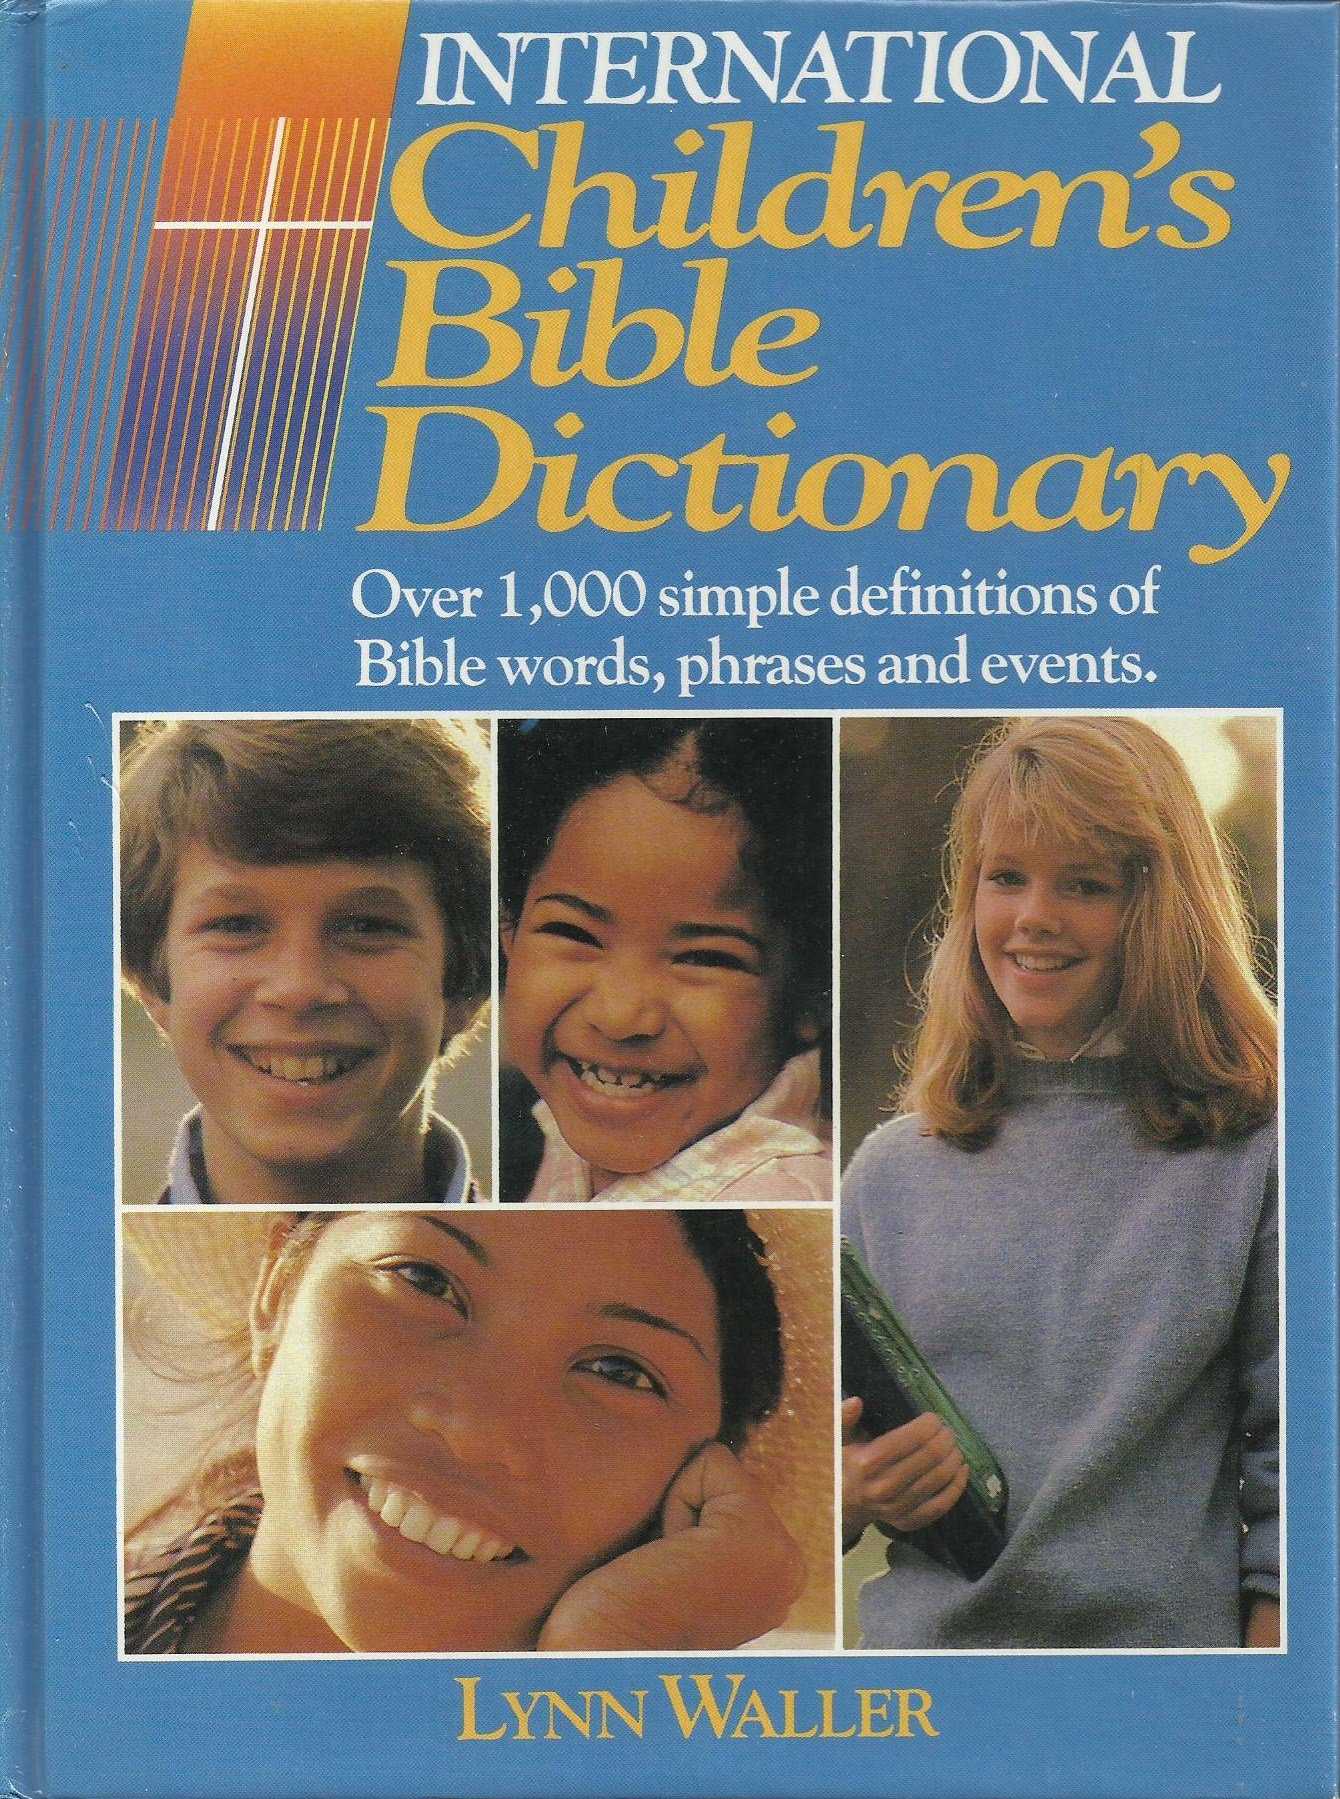 International Children's Bible Dictionary